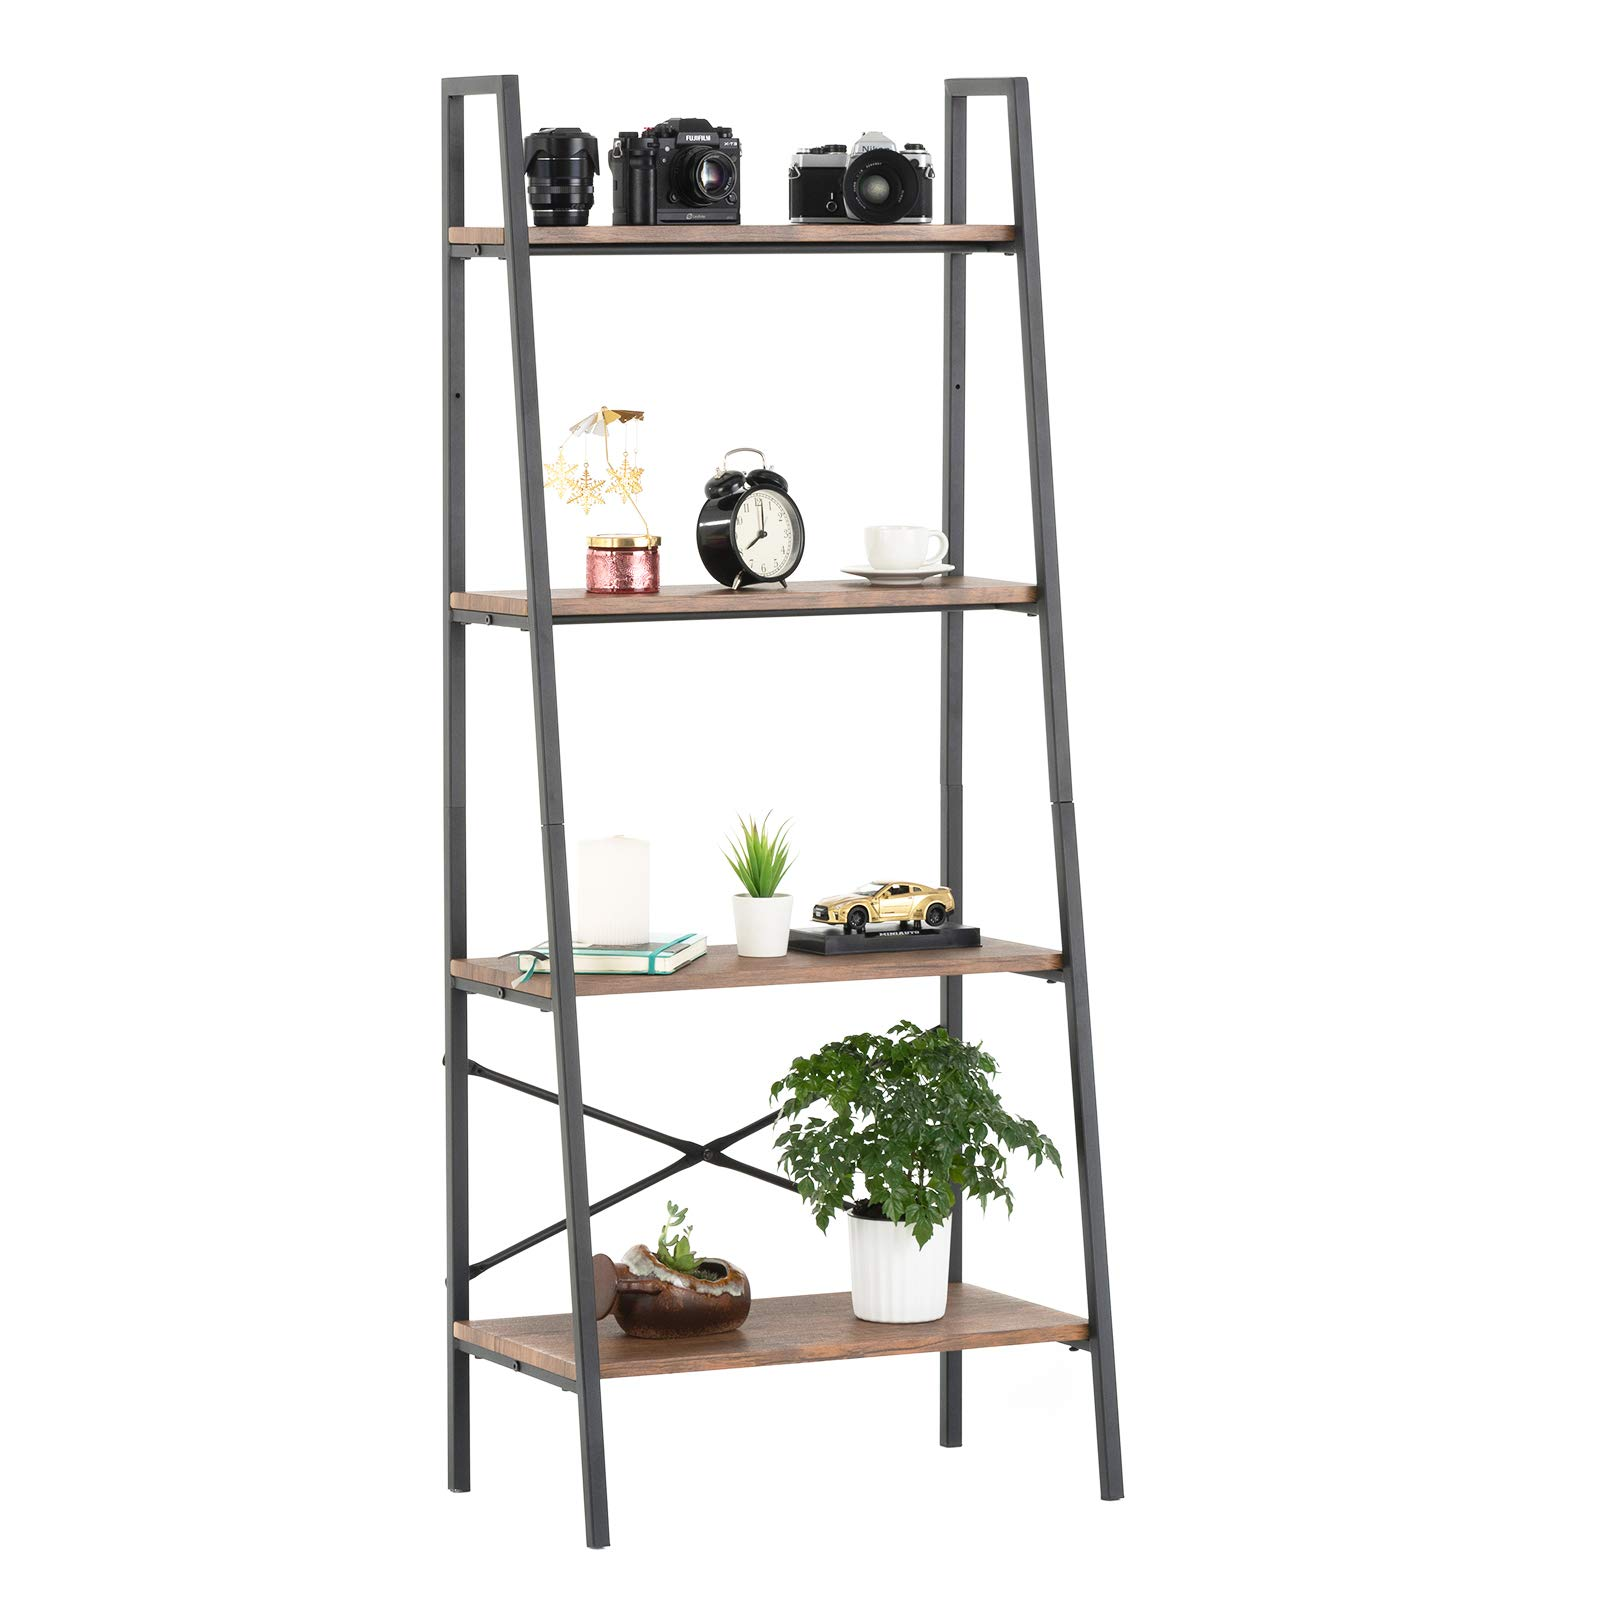 mecor 4-Tier Industrial Ladder Shelf, Bookshelf,Metal Frame Storage Rack Shelves,Modern Design Furniture for Home Office,Rustic Brown by mecor